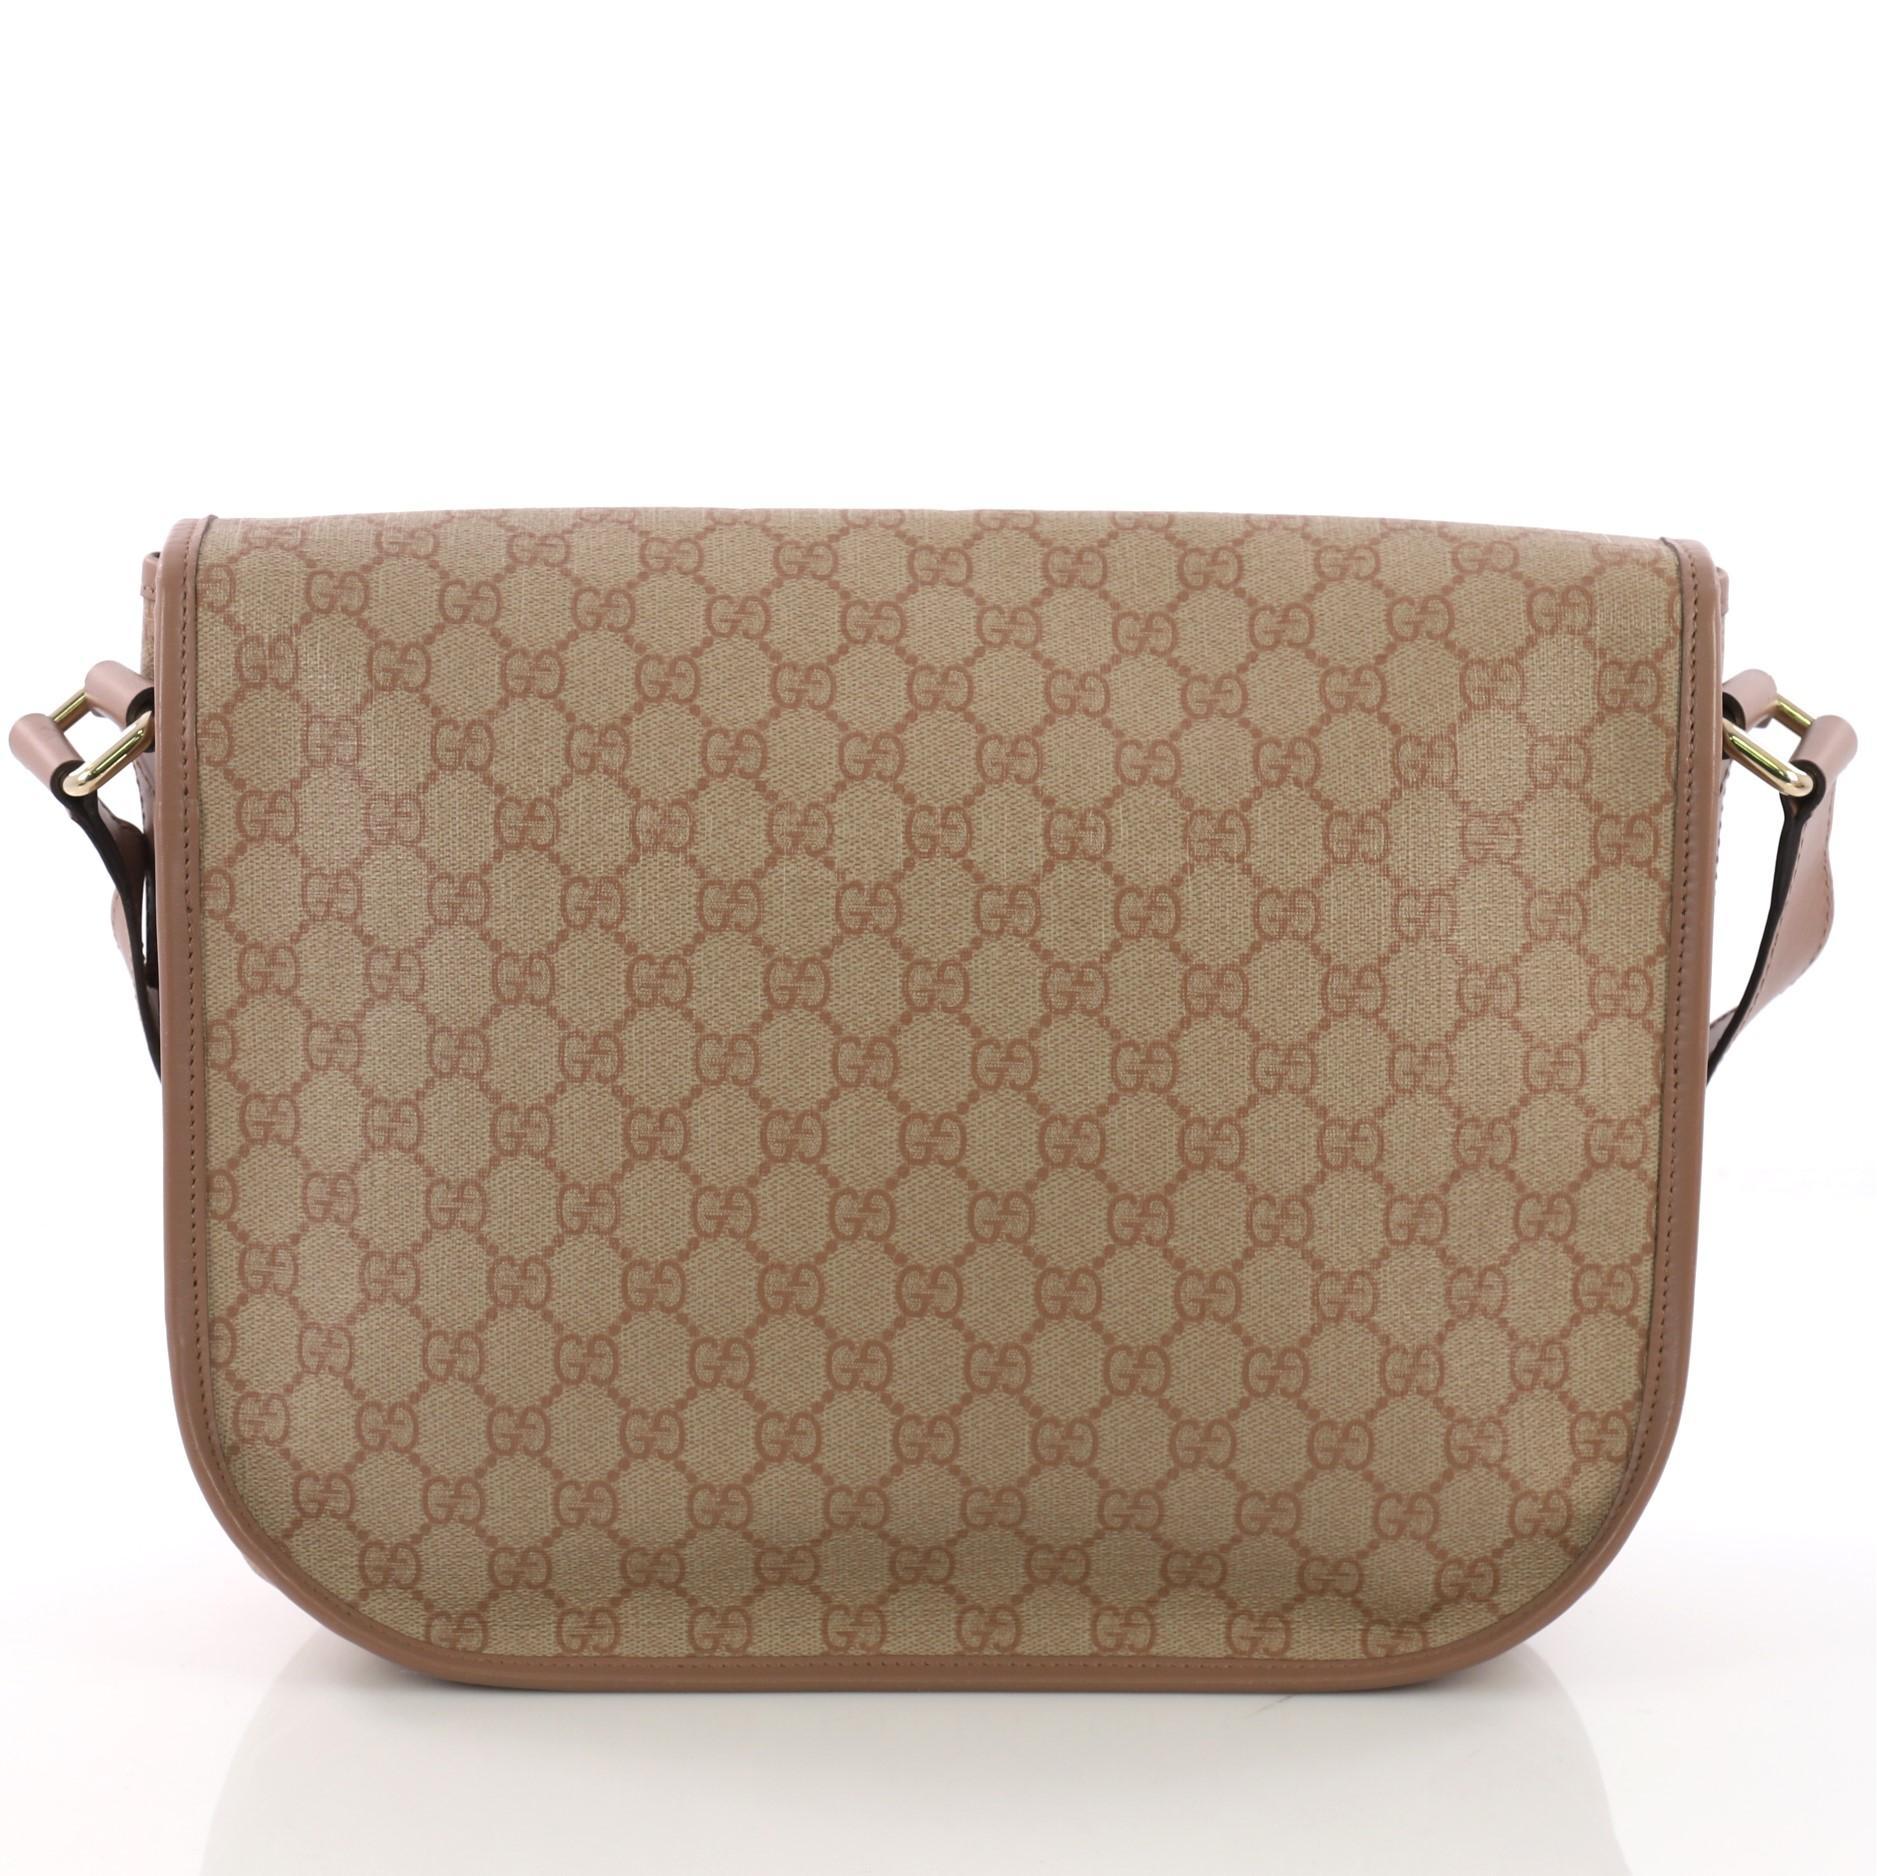 0b9feb3c741 Gucci Messenger Buckle Bag GG Coated Canvas Medium at 1stdibs